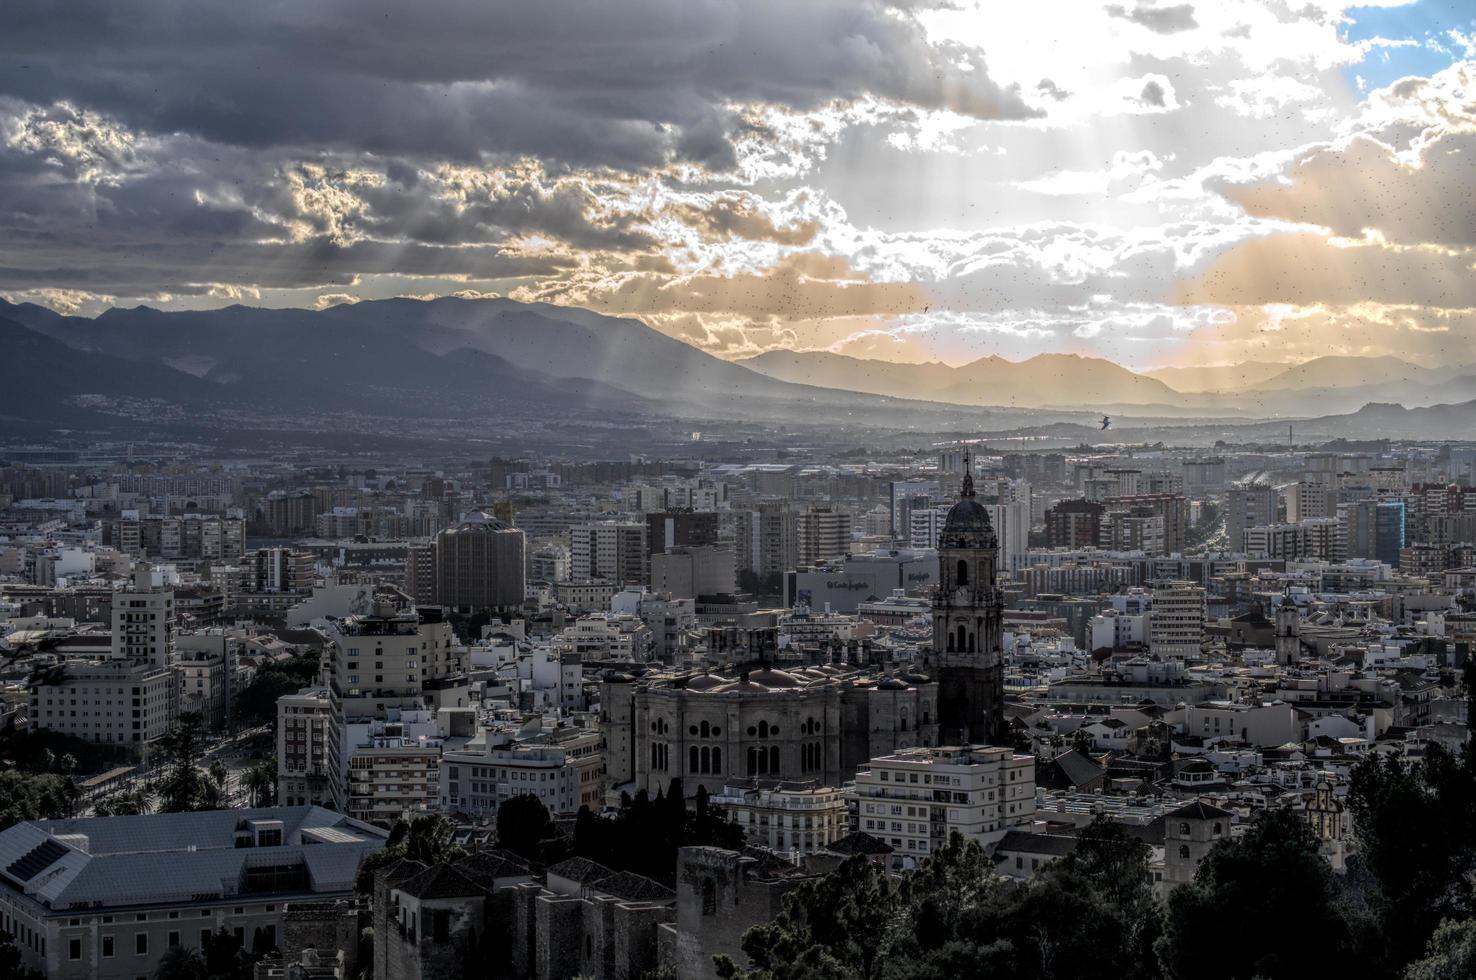 Cityscape of Malaga photo